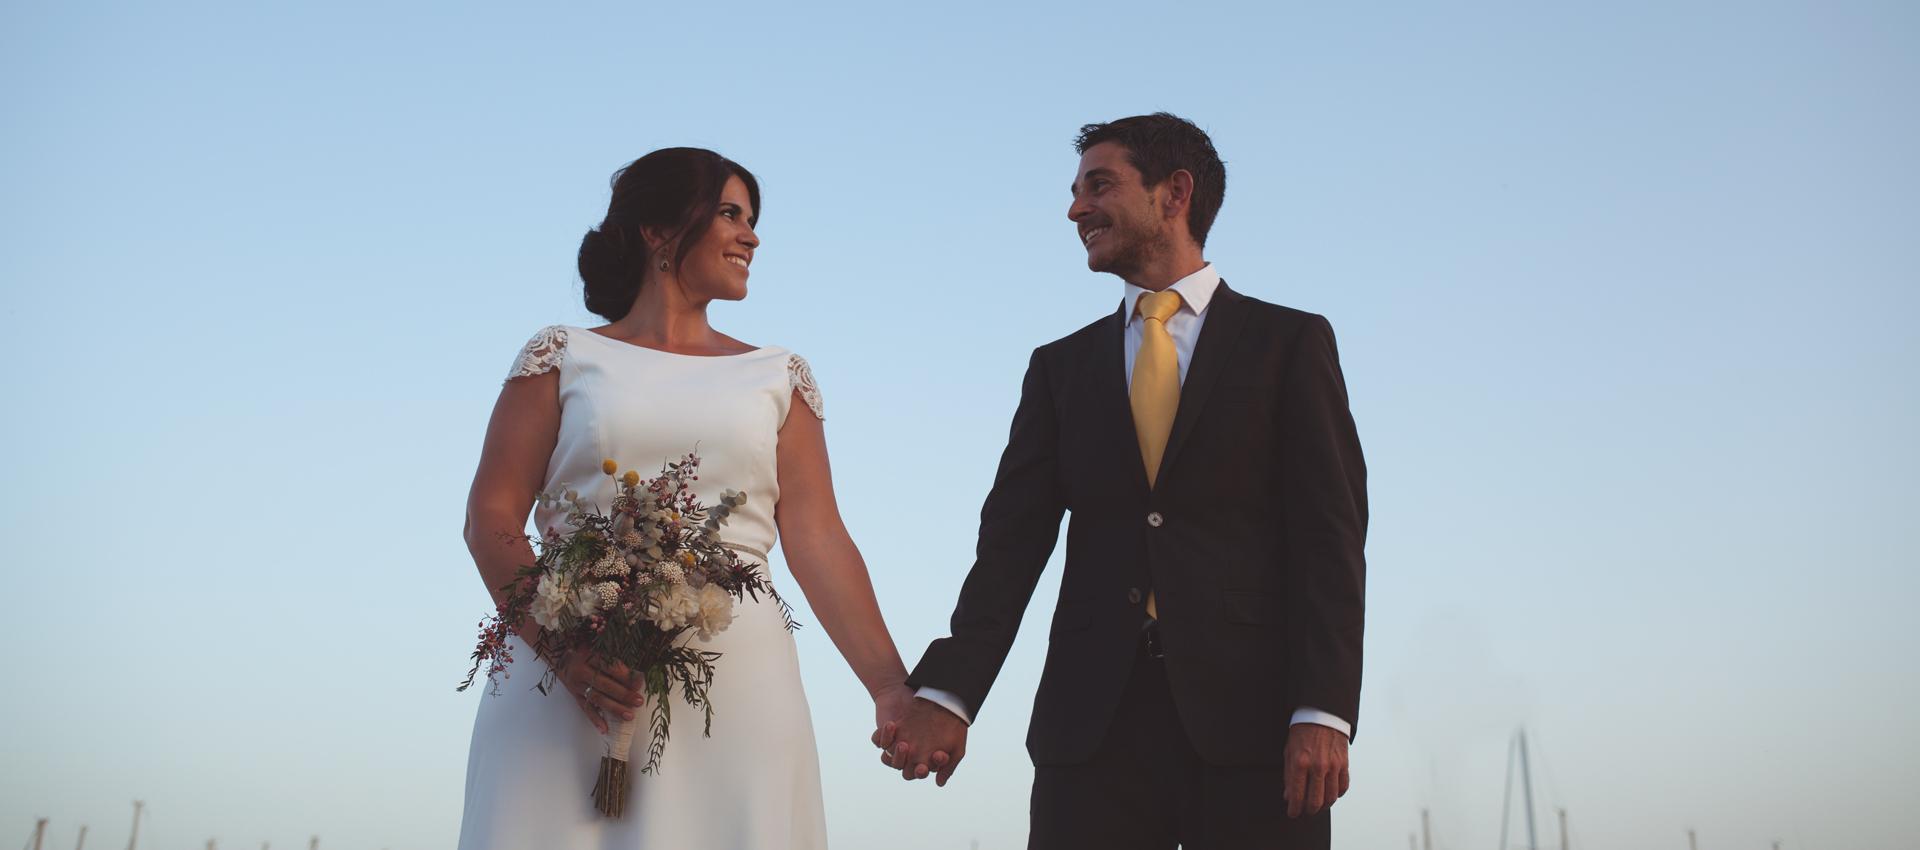 IMG_5732 Back to the Wedding - video boda cadiz